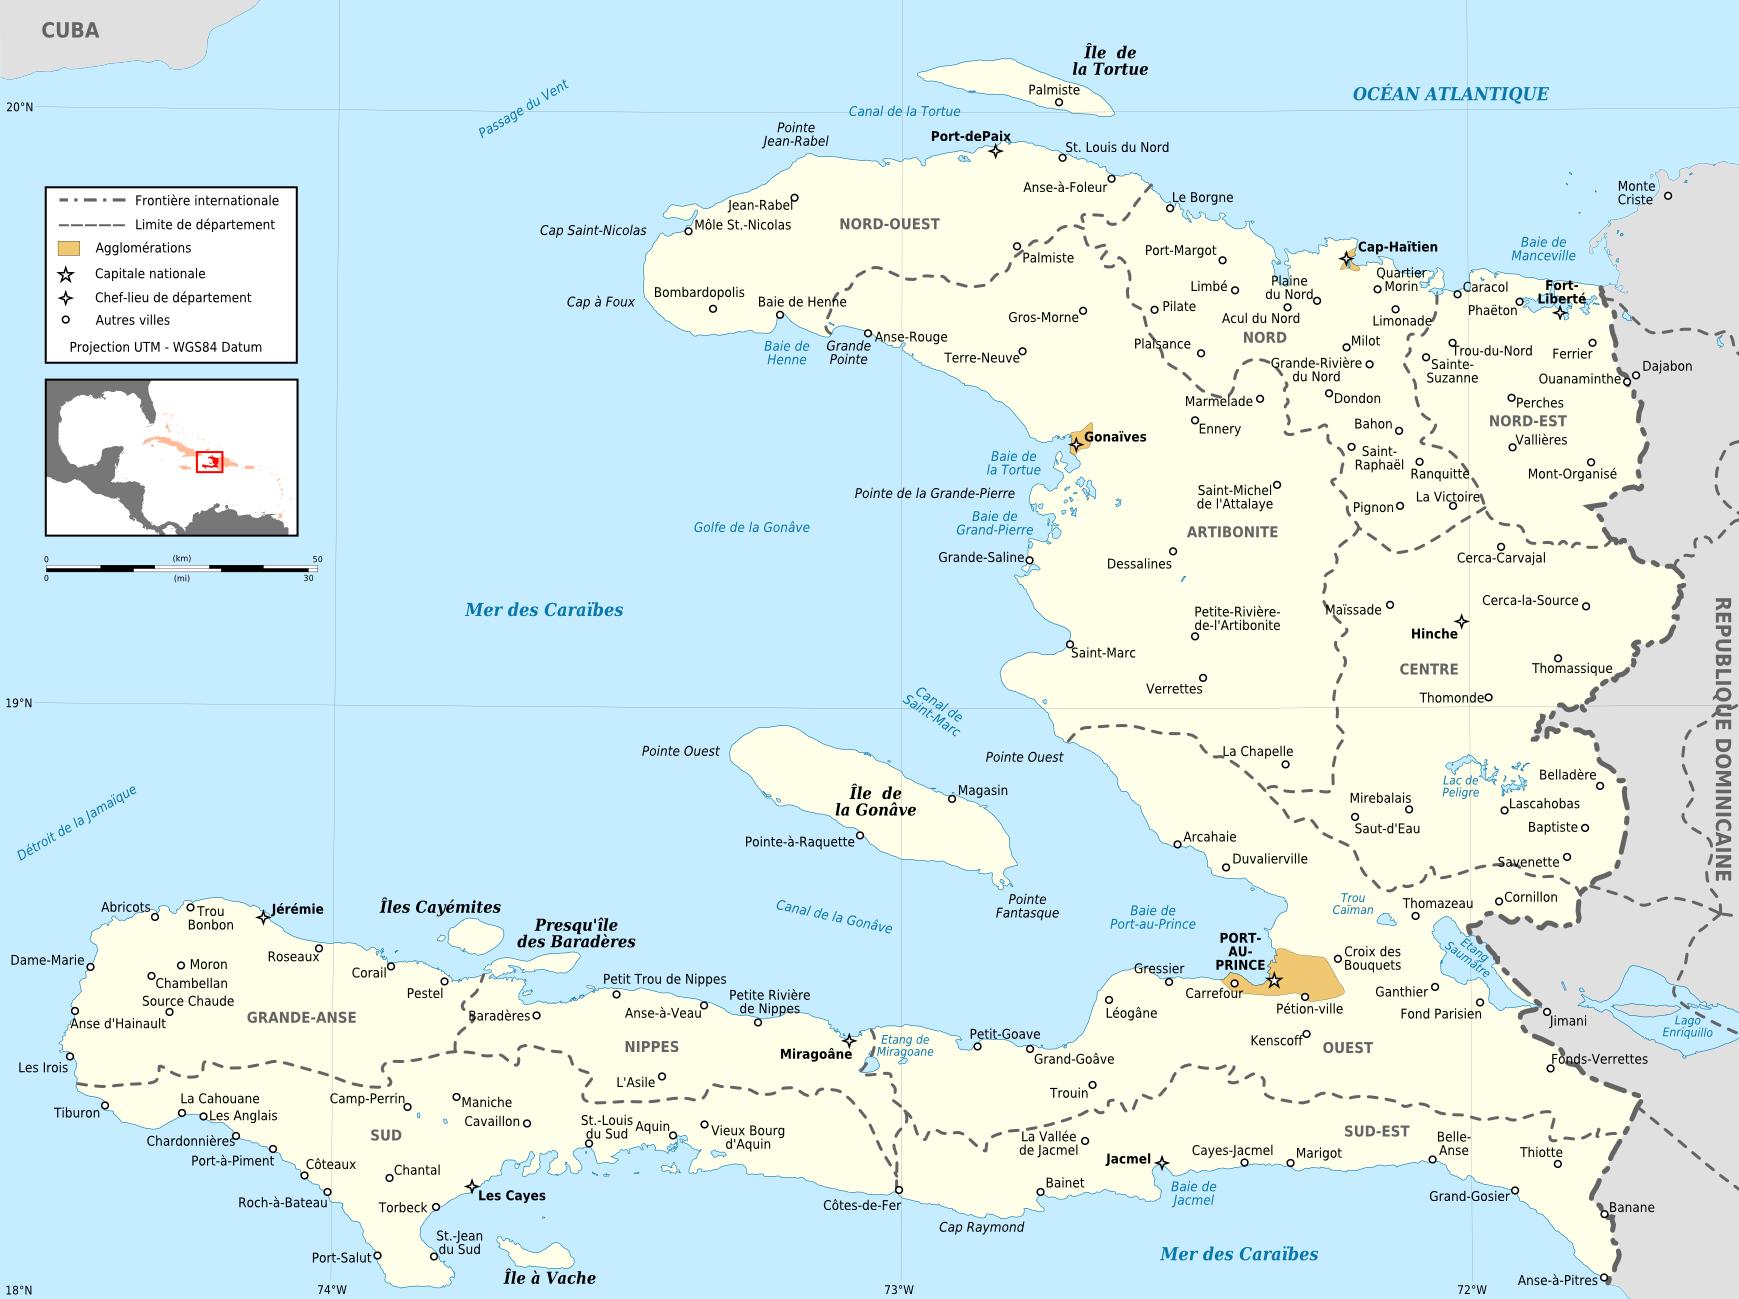 Map of Haiti (Political Map) : Weltkarte.com - Karten und Stadtpläne ...